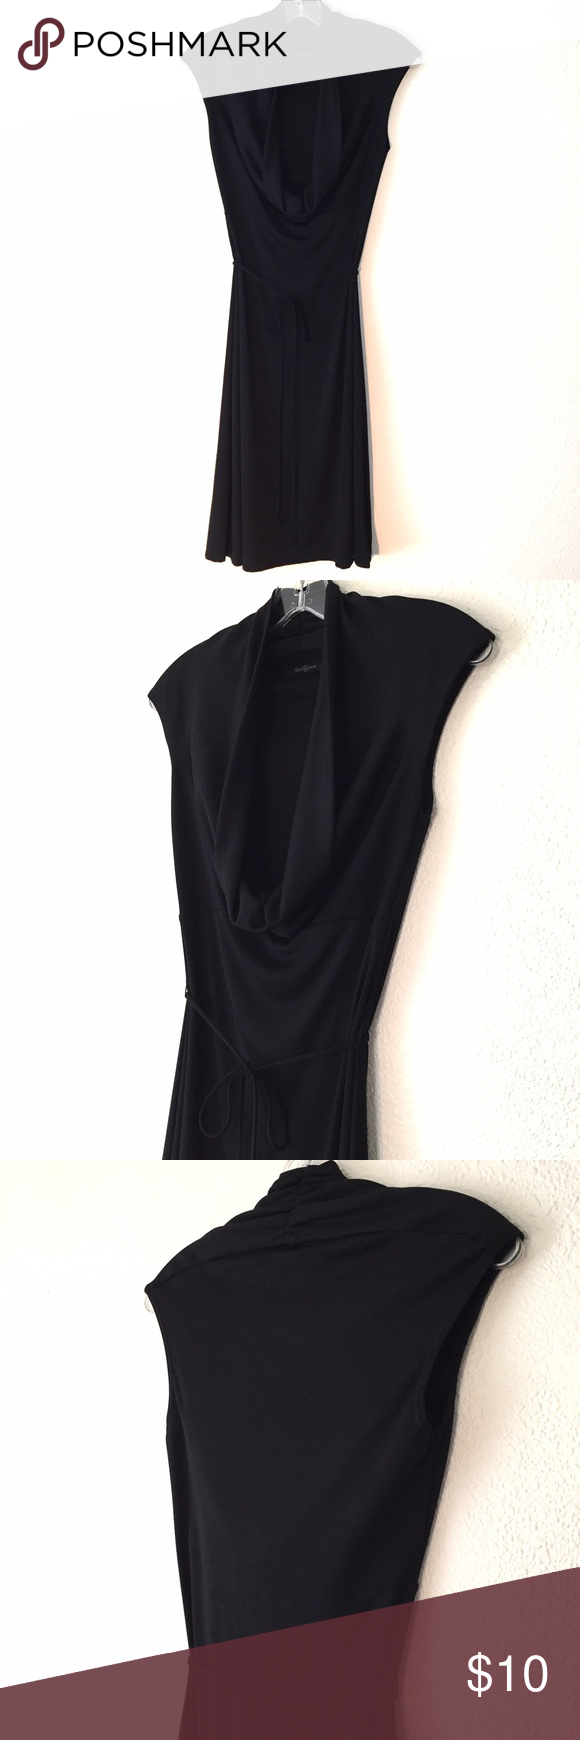 Cowl neck lbd little black dresses forever dresses and cowl neck